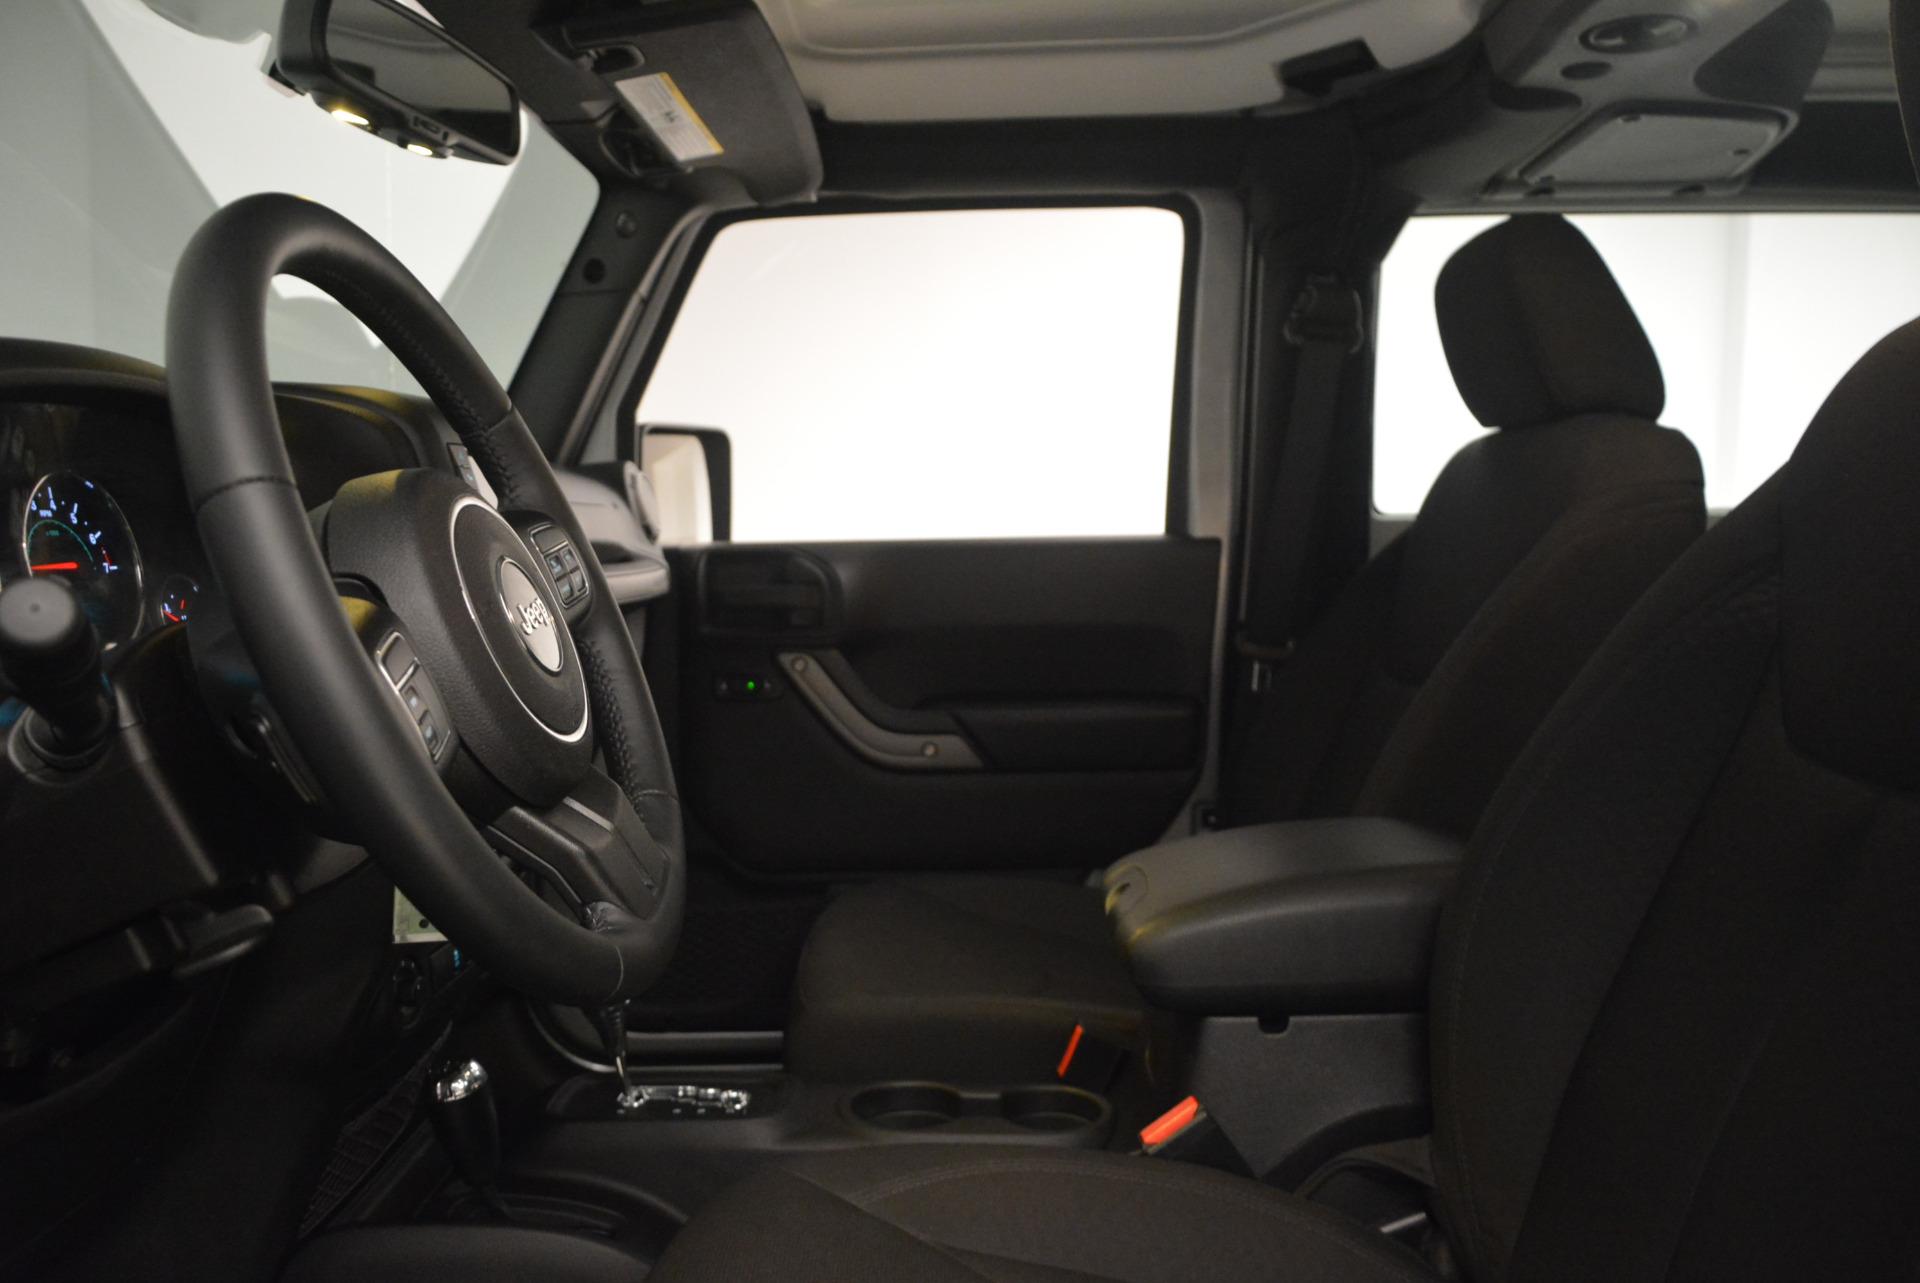 Used 2015 Jeep Wrangler Sport For Sale In Greenwich, CT. Alfa Romeo of Greenwich, 7185 1101_p21